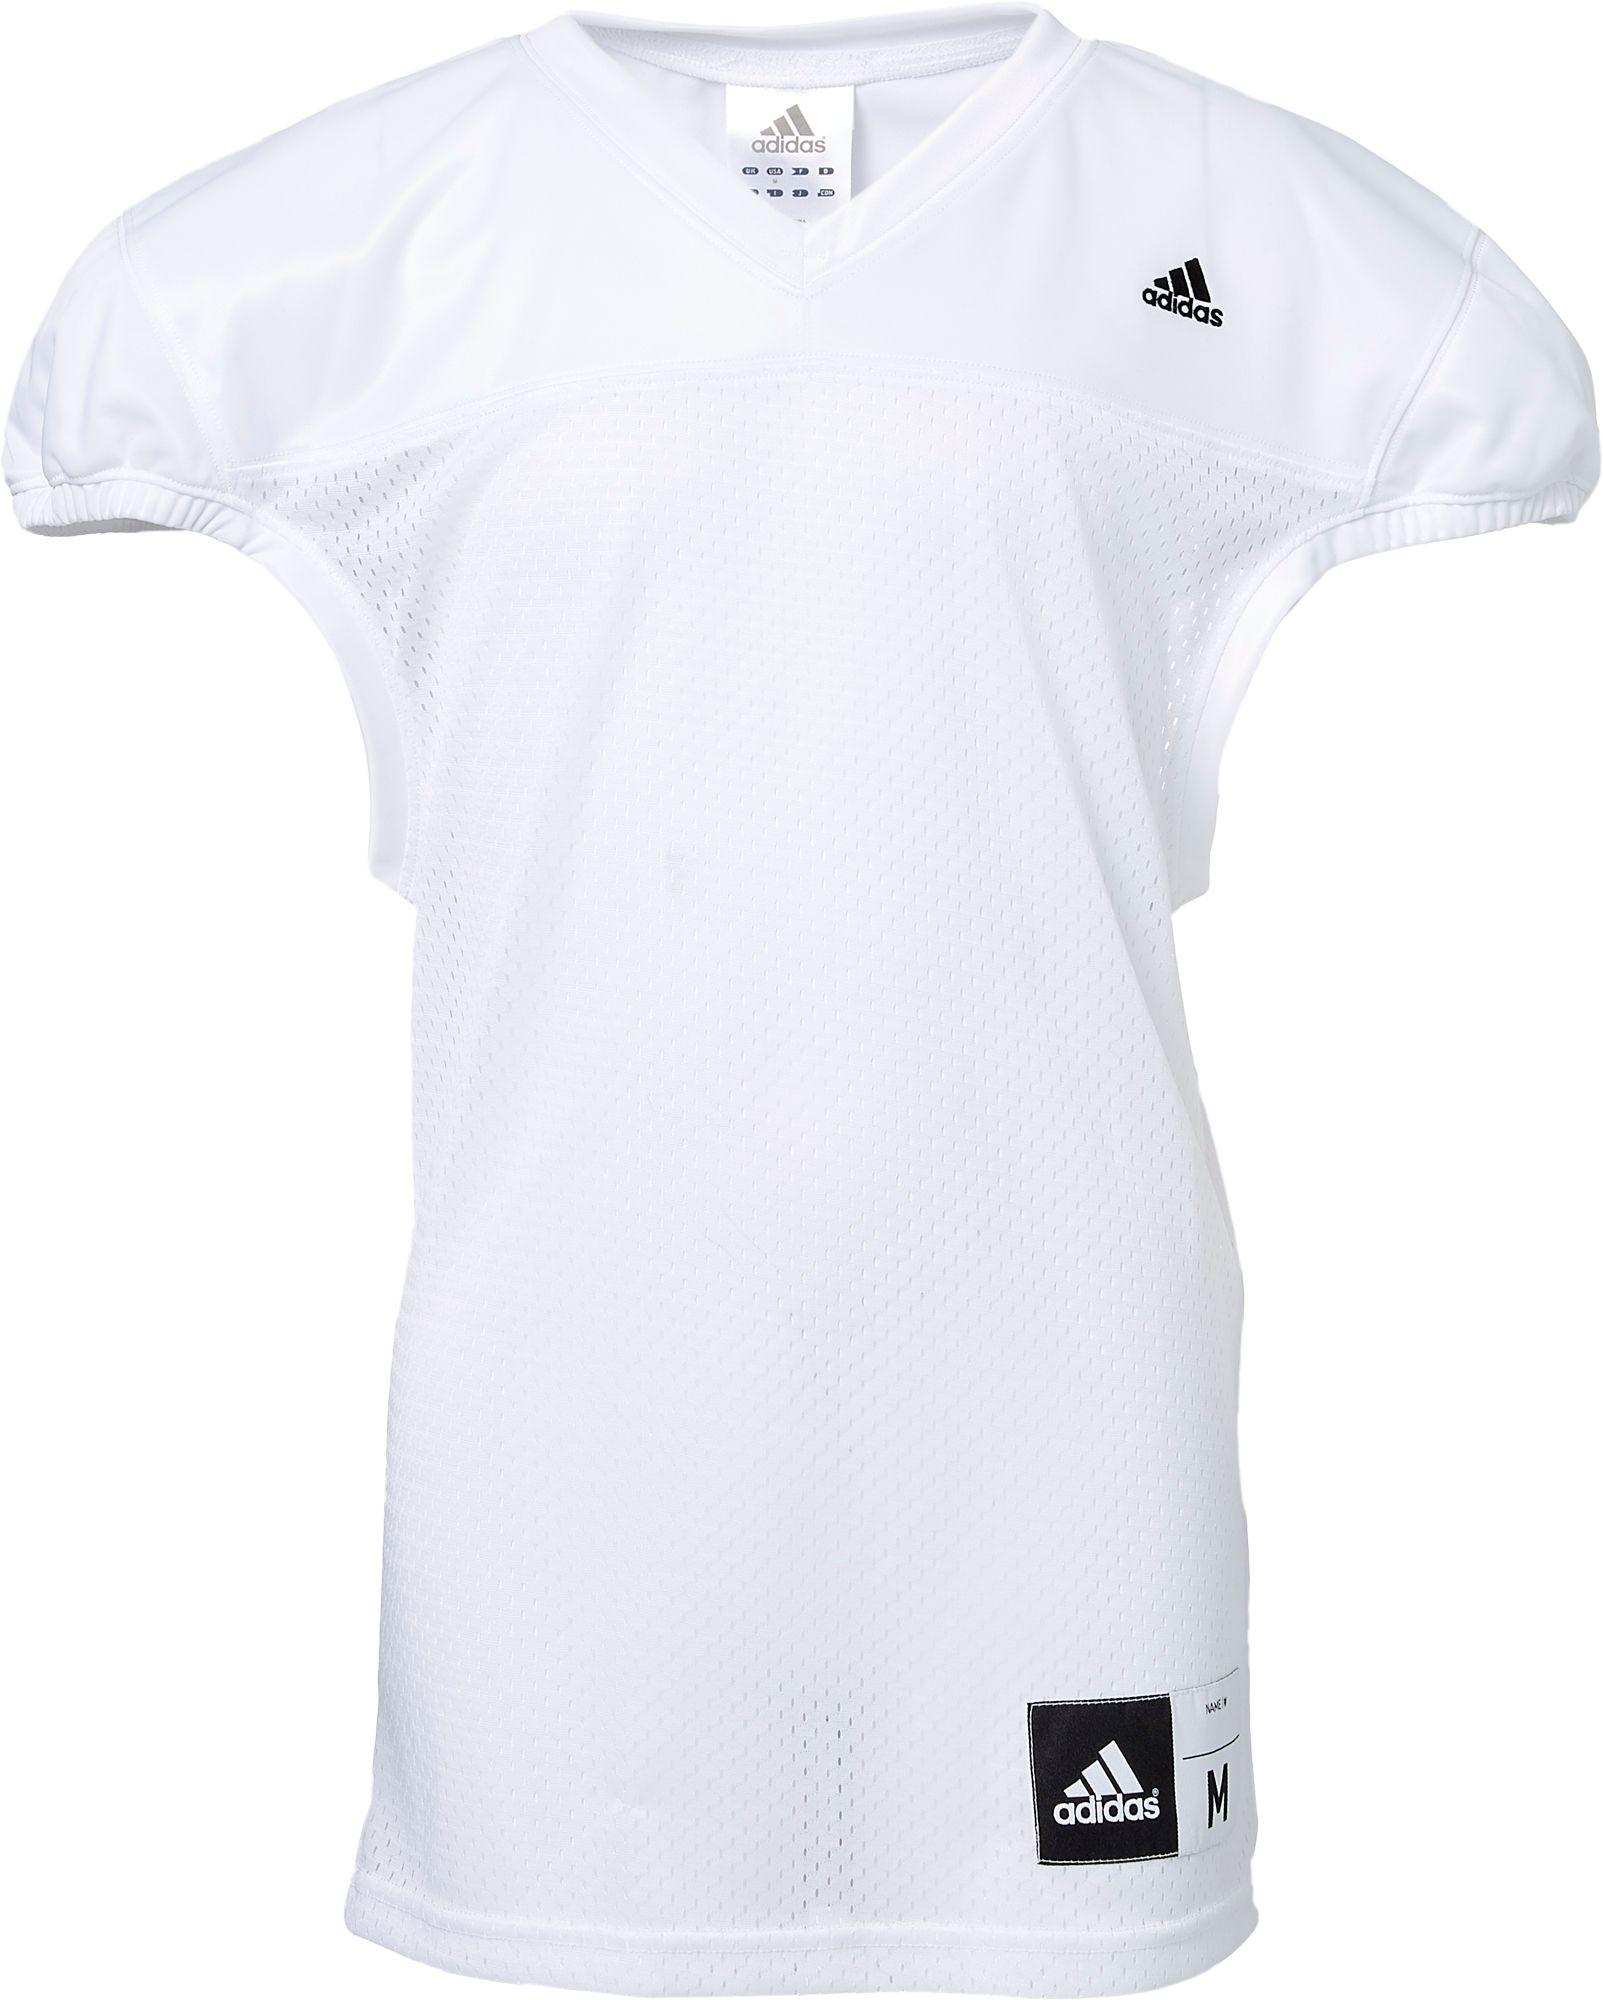 Football practice jersey